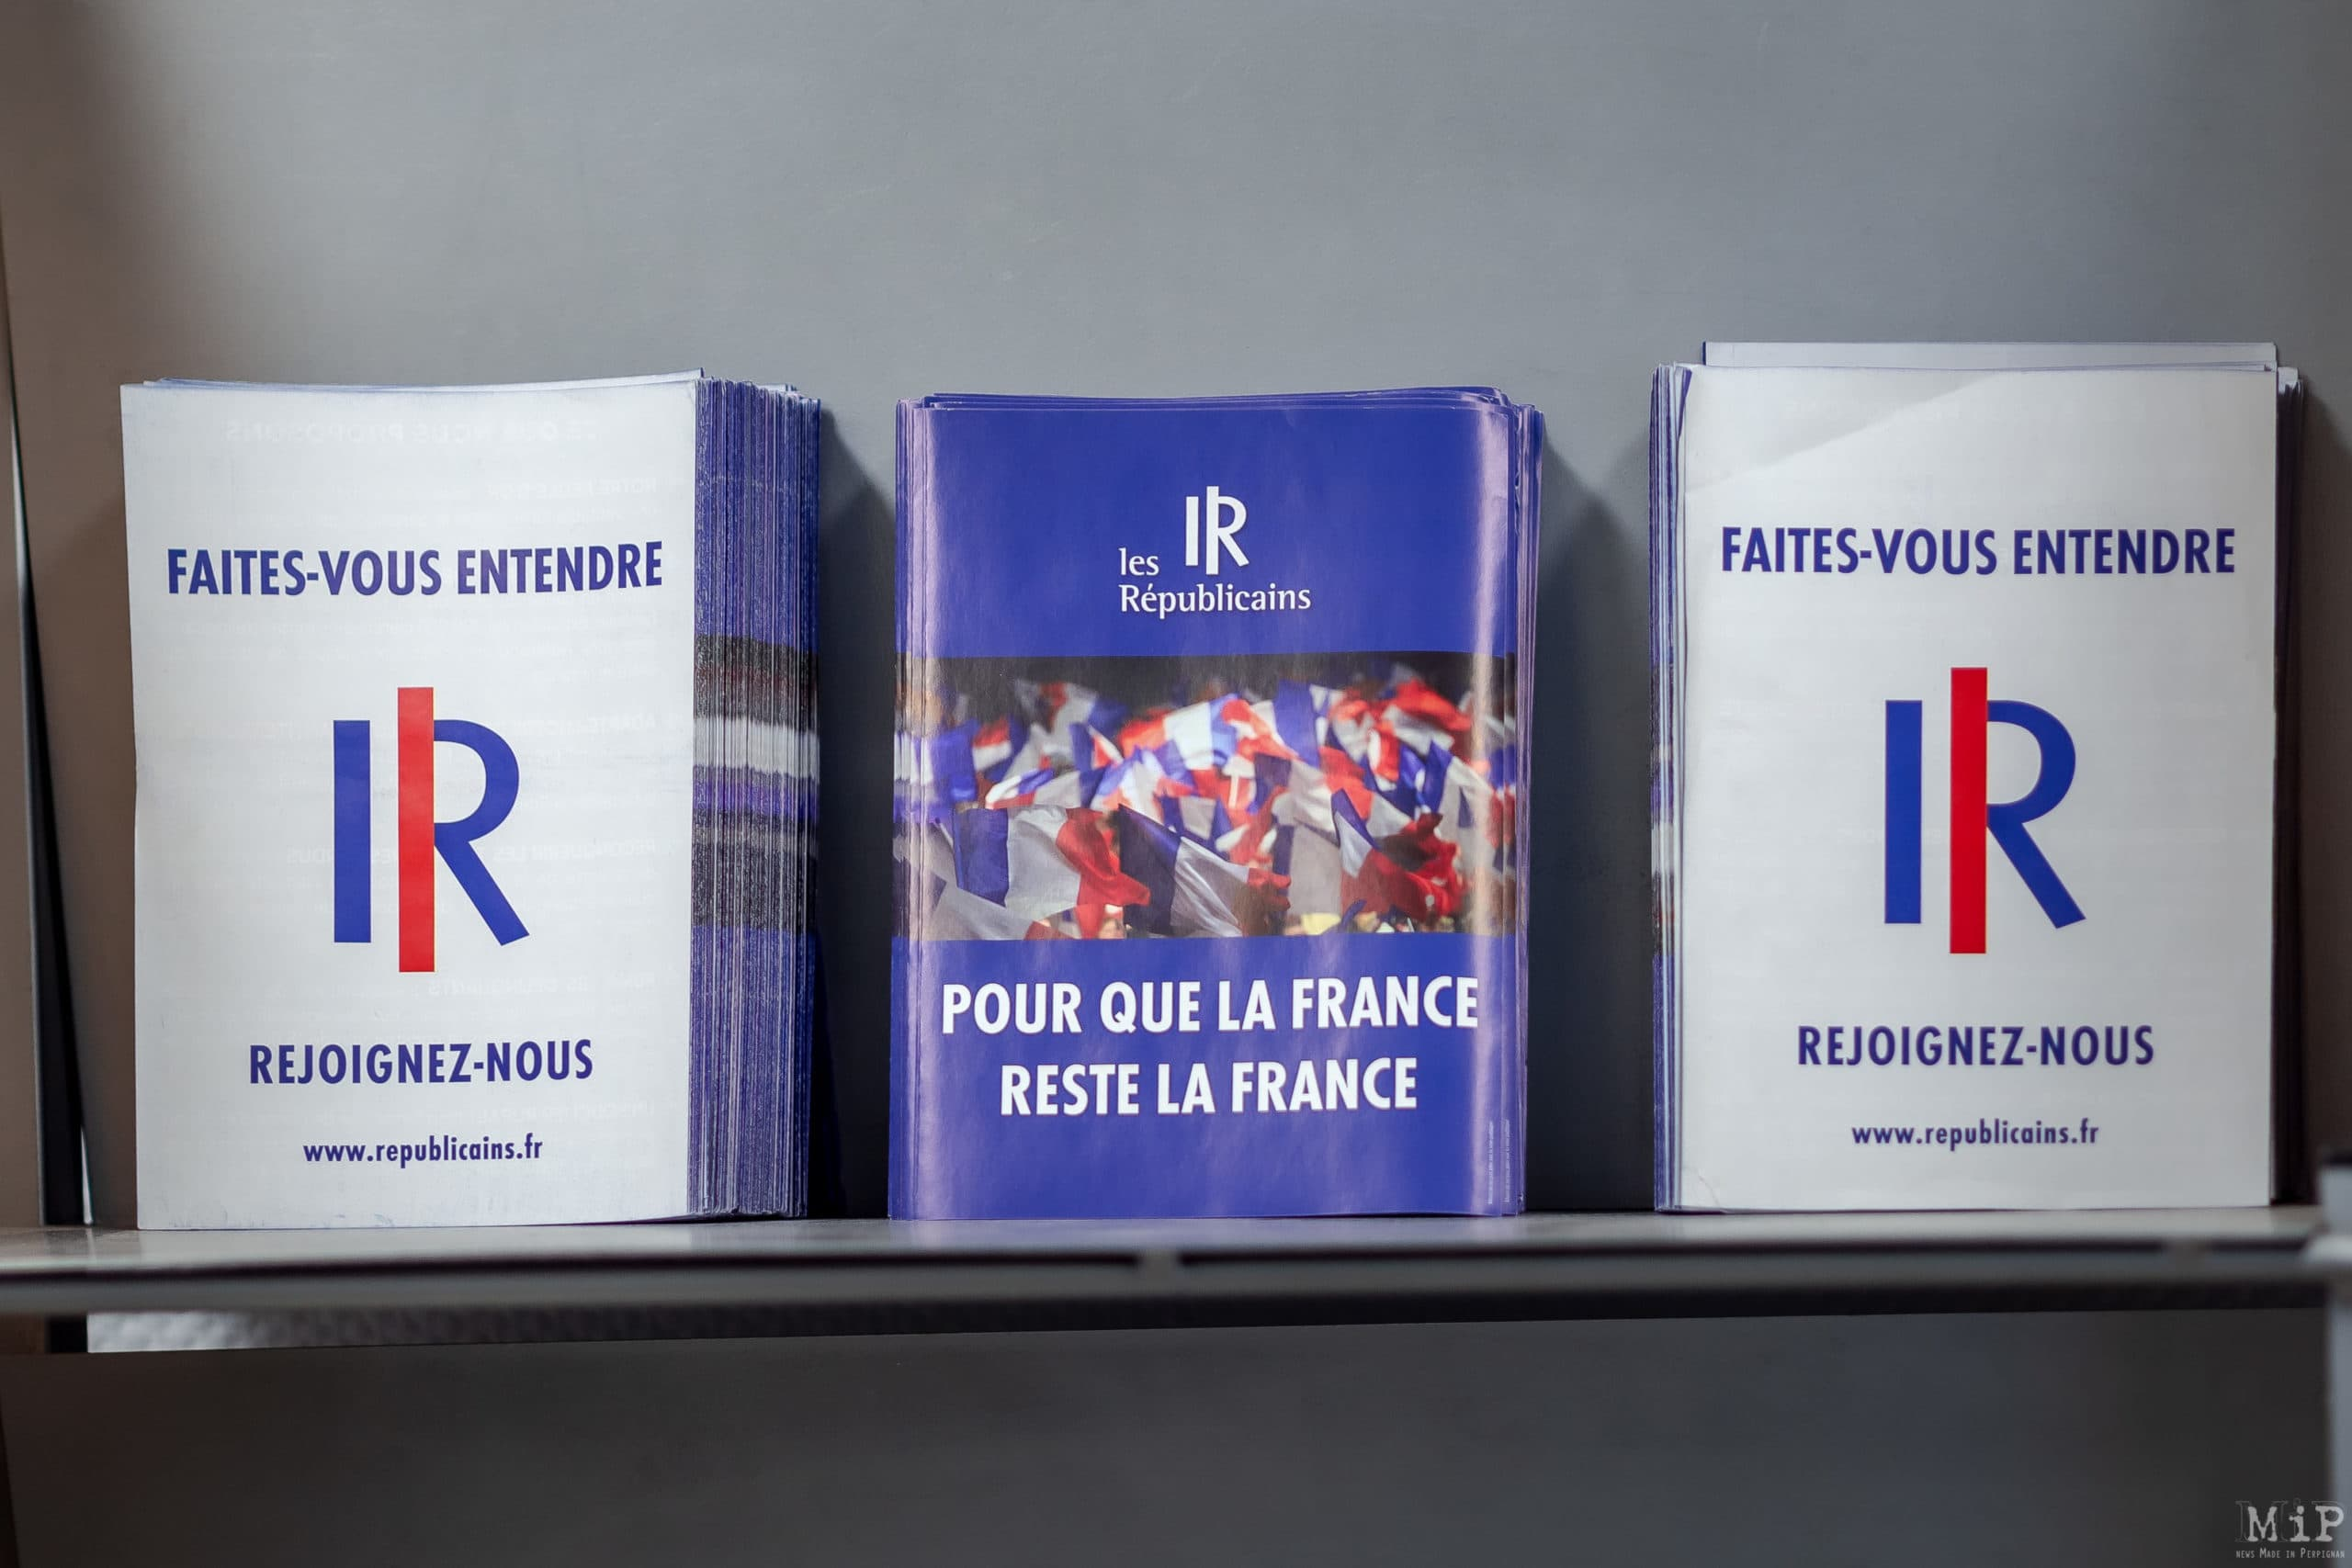 15/04/2021, Perpignan, France, Aurélien Pradié, Stéphane Loda, Régionales Occitanie © Arnaud Le Vu / MiP